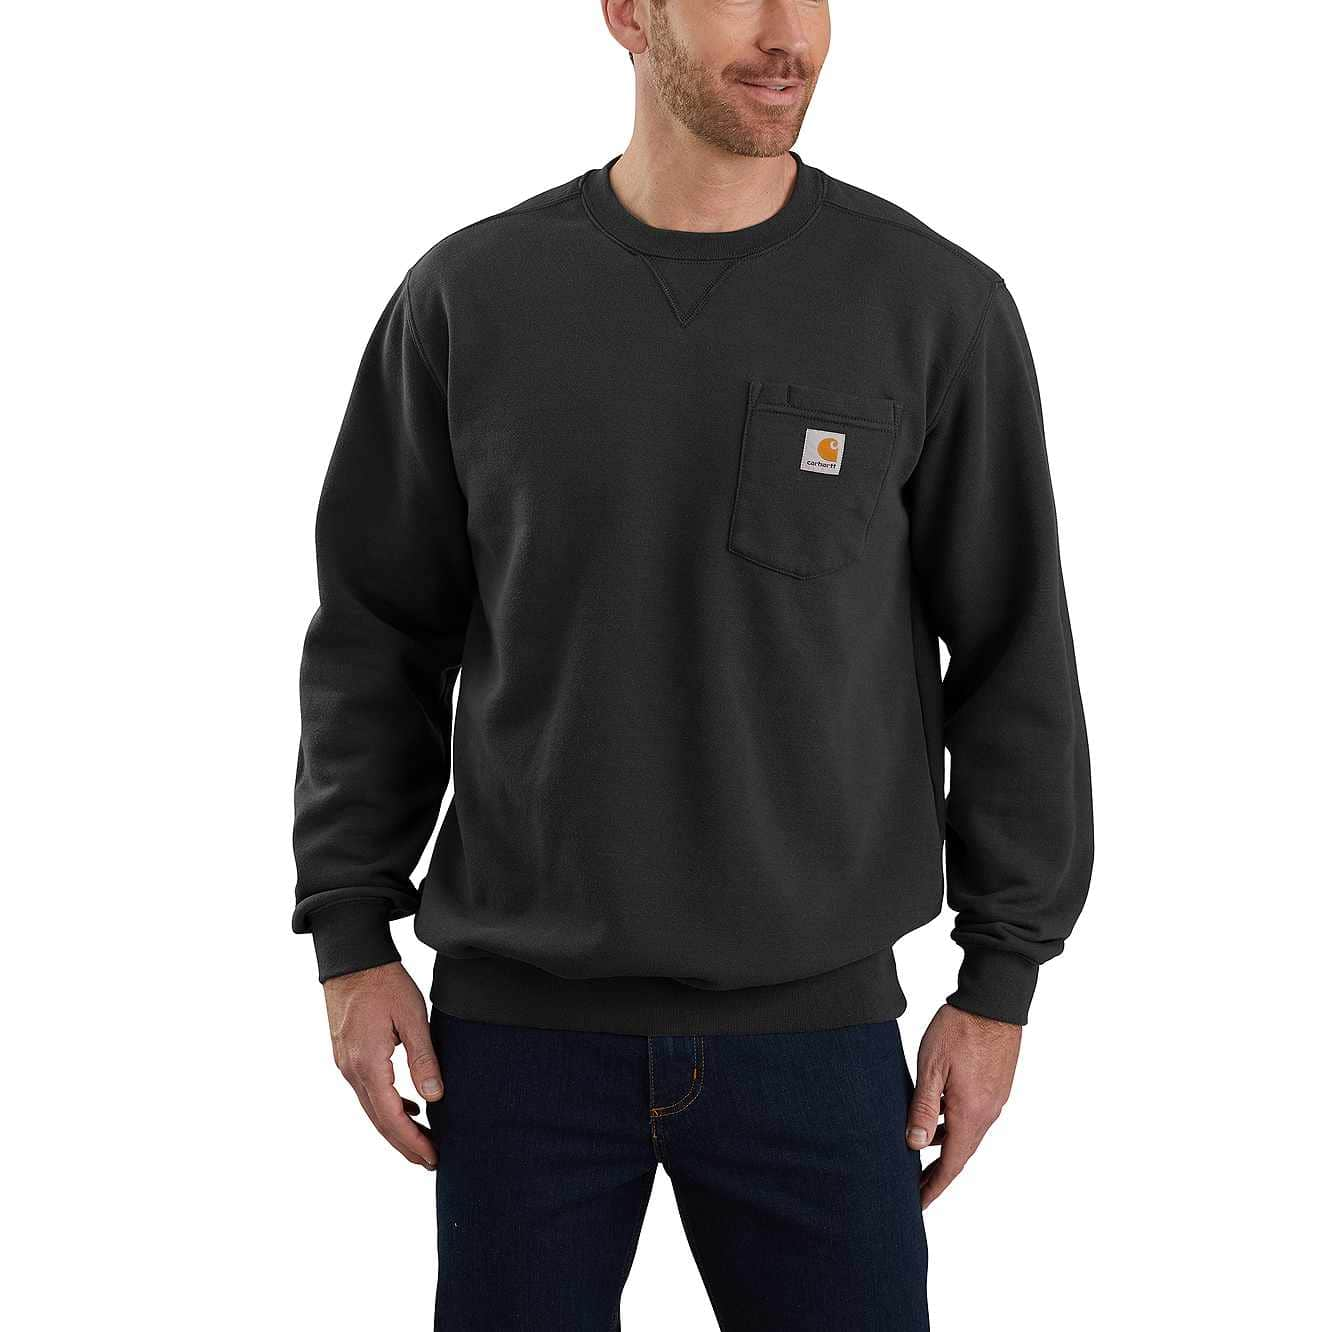 Picture of Crewneck Pocket Sweatshirt in Black